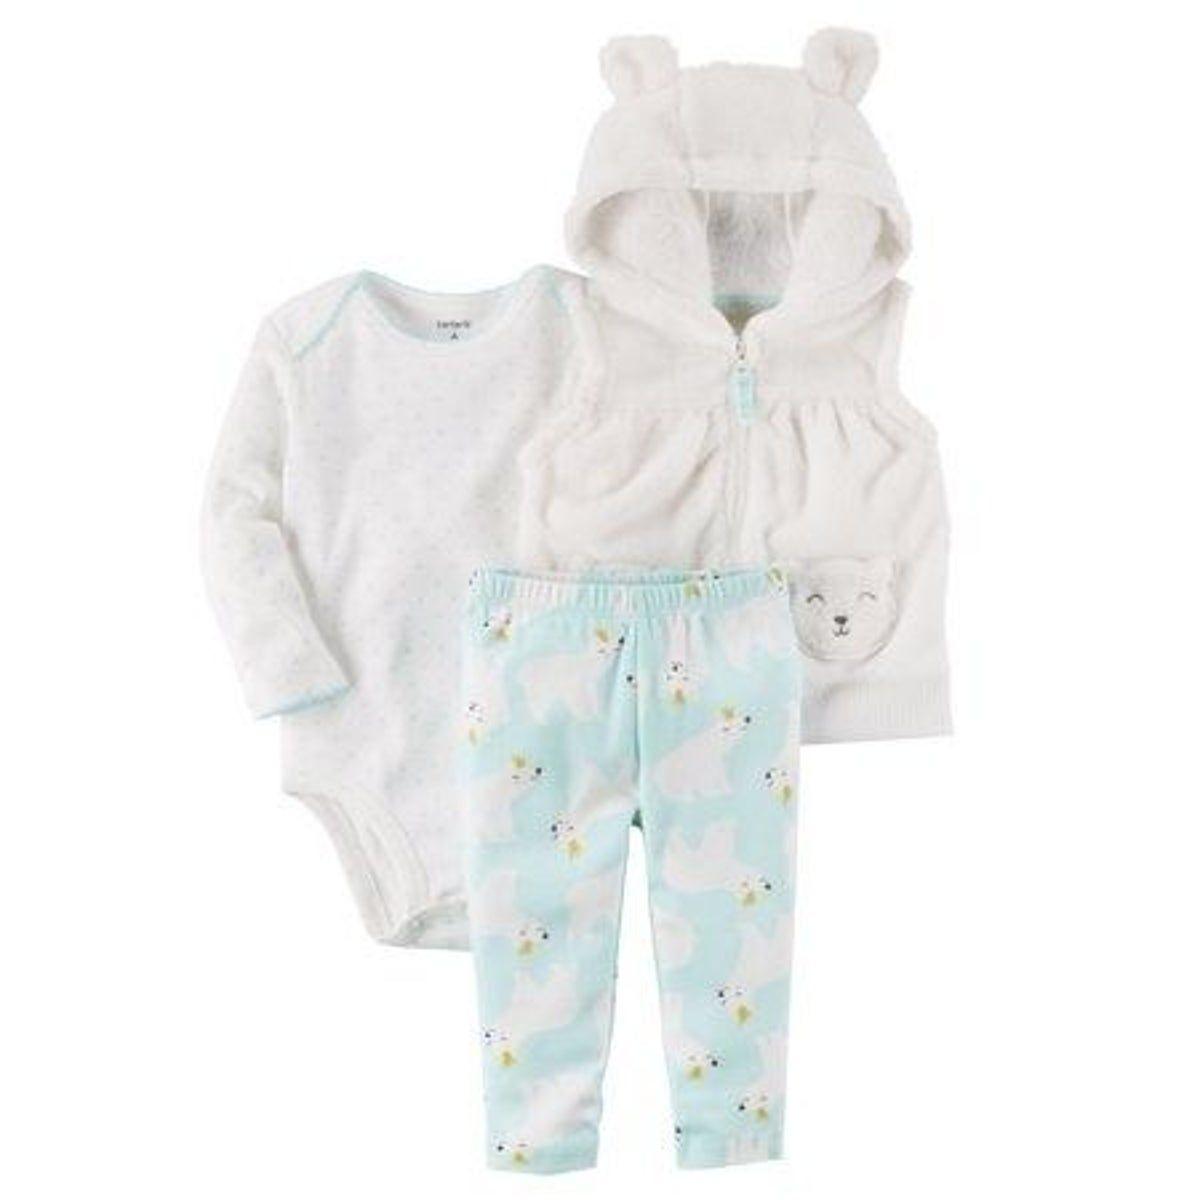 Toddler Baby Boys Bodysuit Short-Sleeve Onesie Love Dance Print Outfit Winter Pajamas